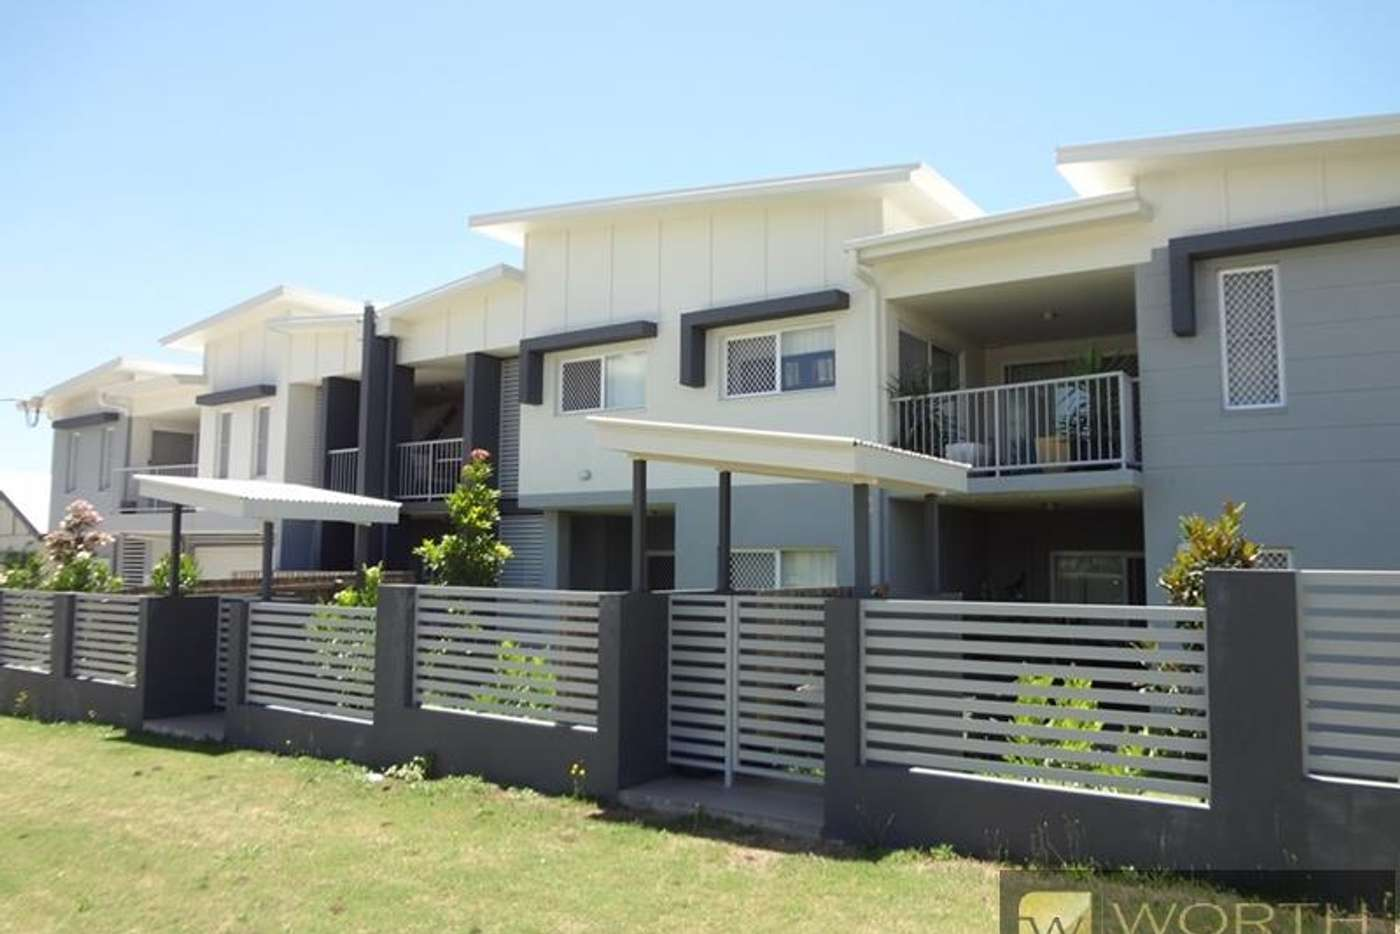 Main view of Homely unit listing, <![CDATA[2/22]]> <![CDATA[Birdwood Street]]>, Zillmere QLD 4034